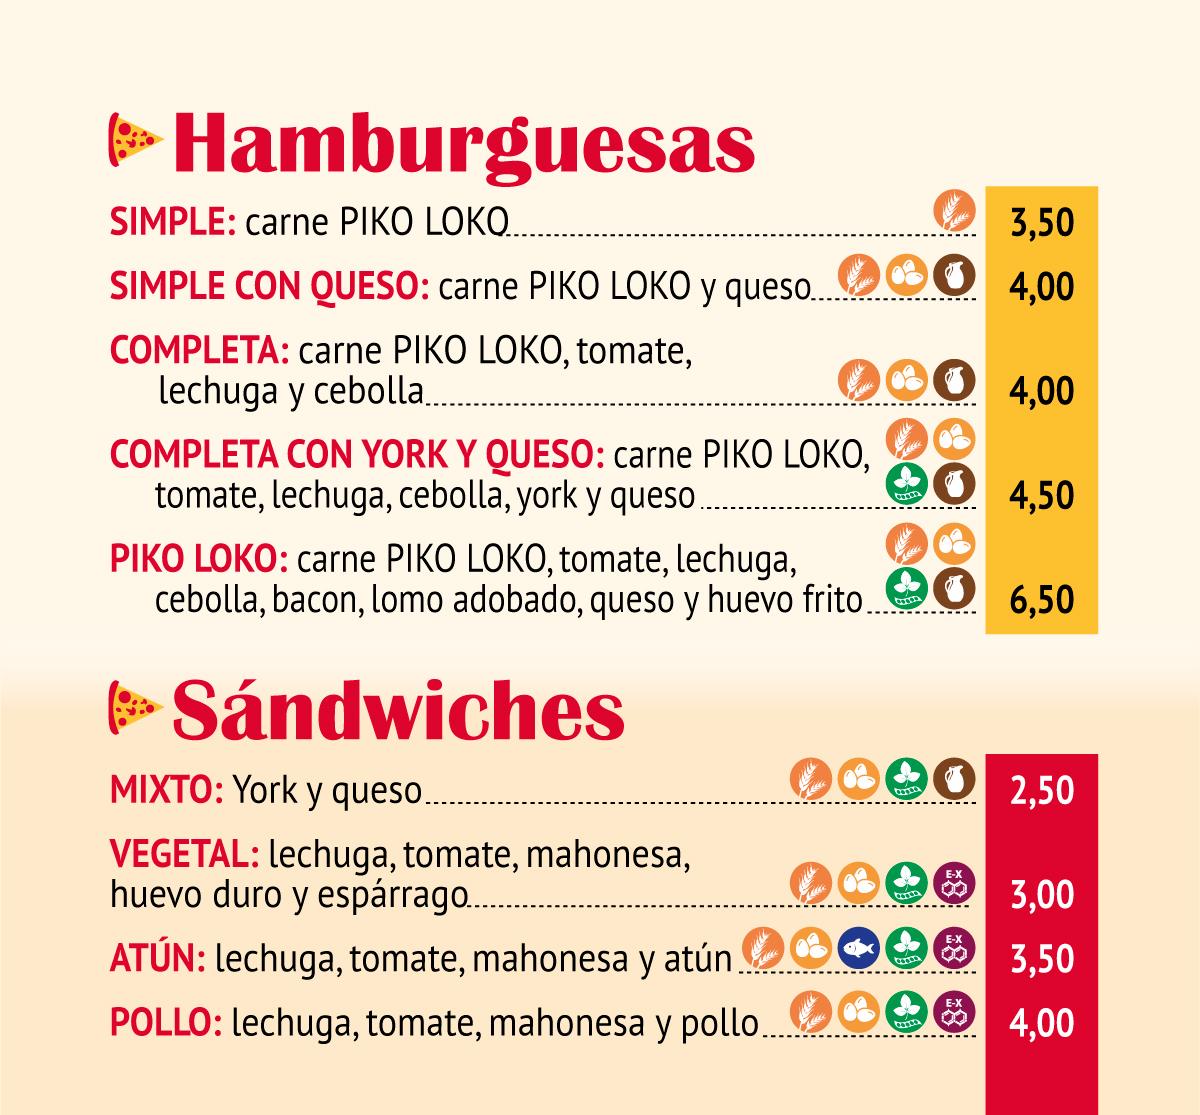 hamburguesas-y-sandwiches